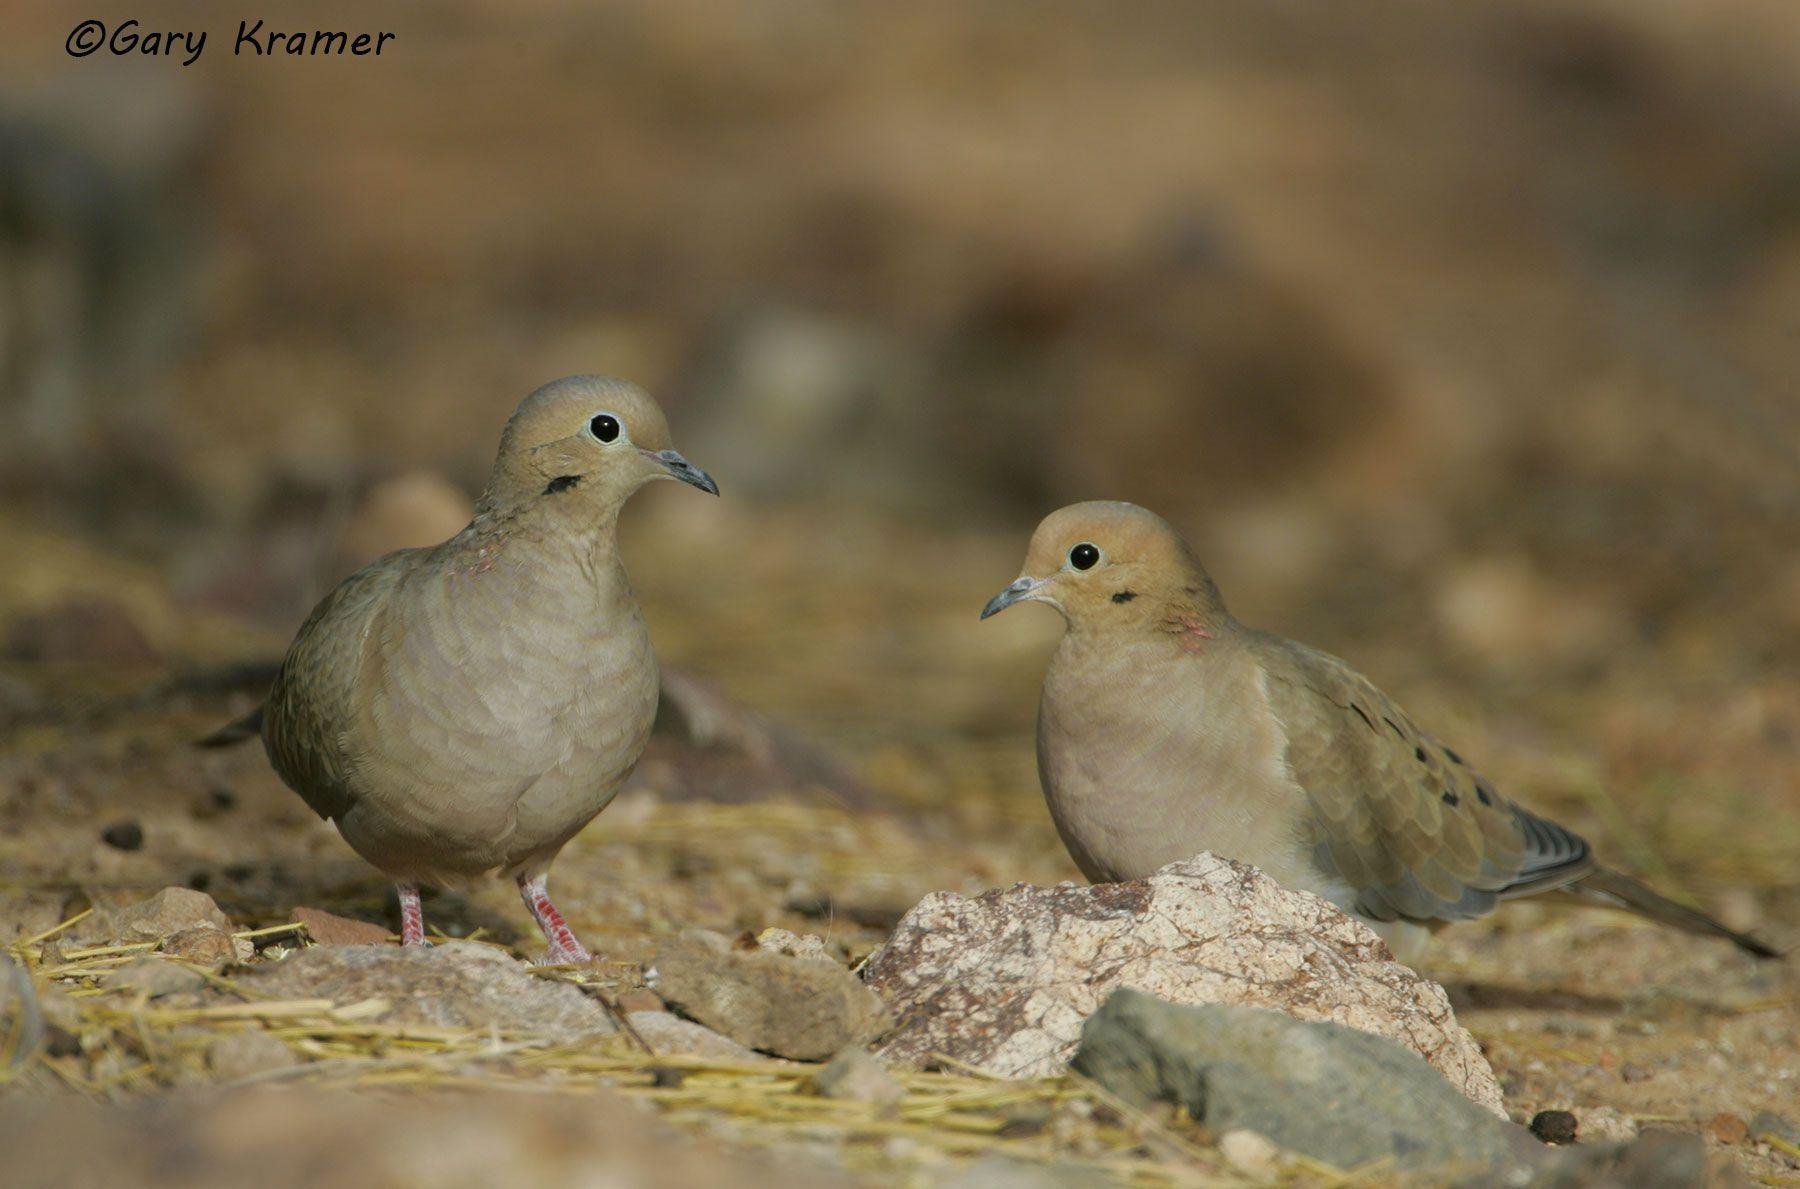 Mourning Dove (Zenaida macroura) - NBDM#237d